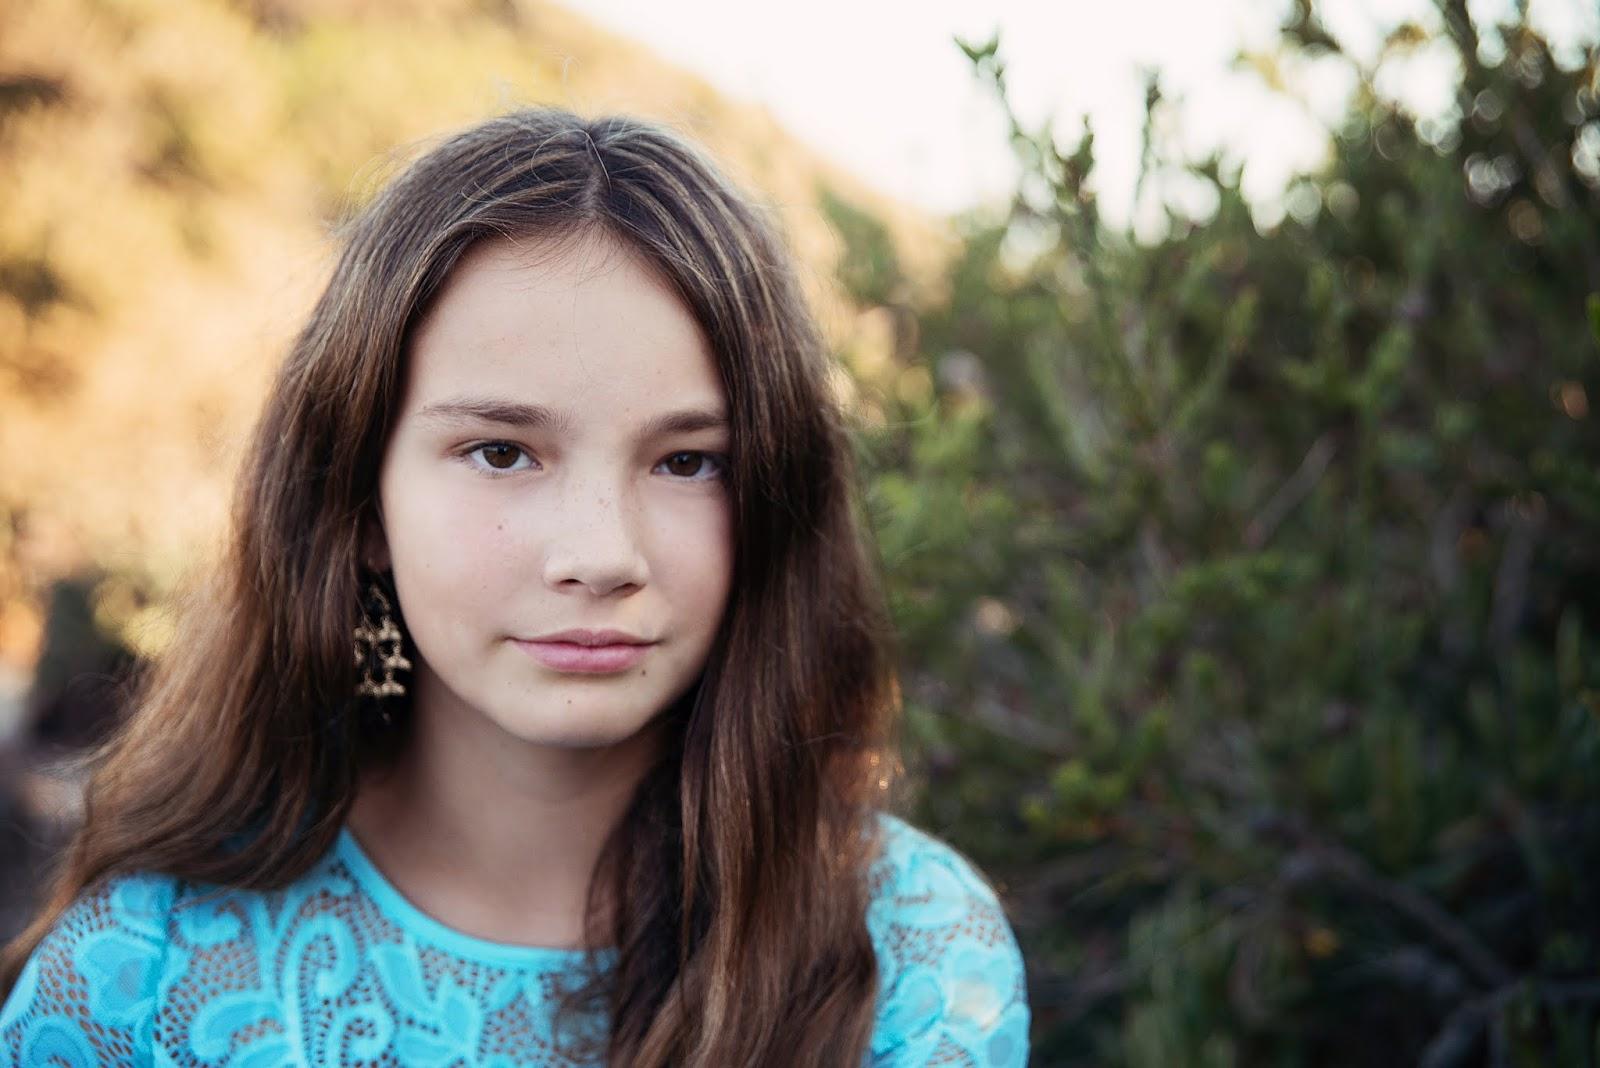 .Bree.San Diego, CA photographer-Julie Dawn Photography